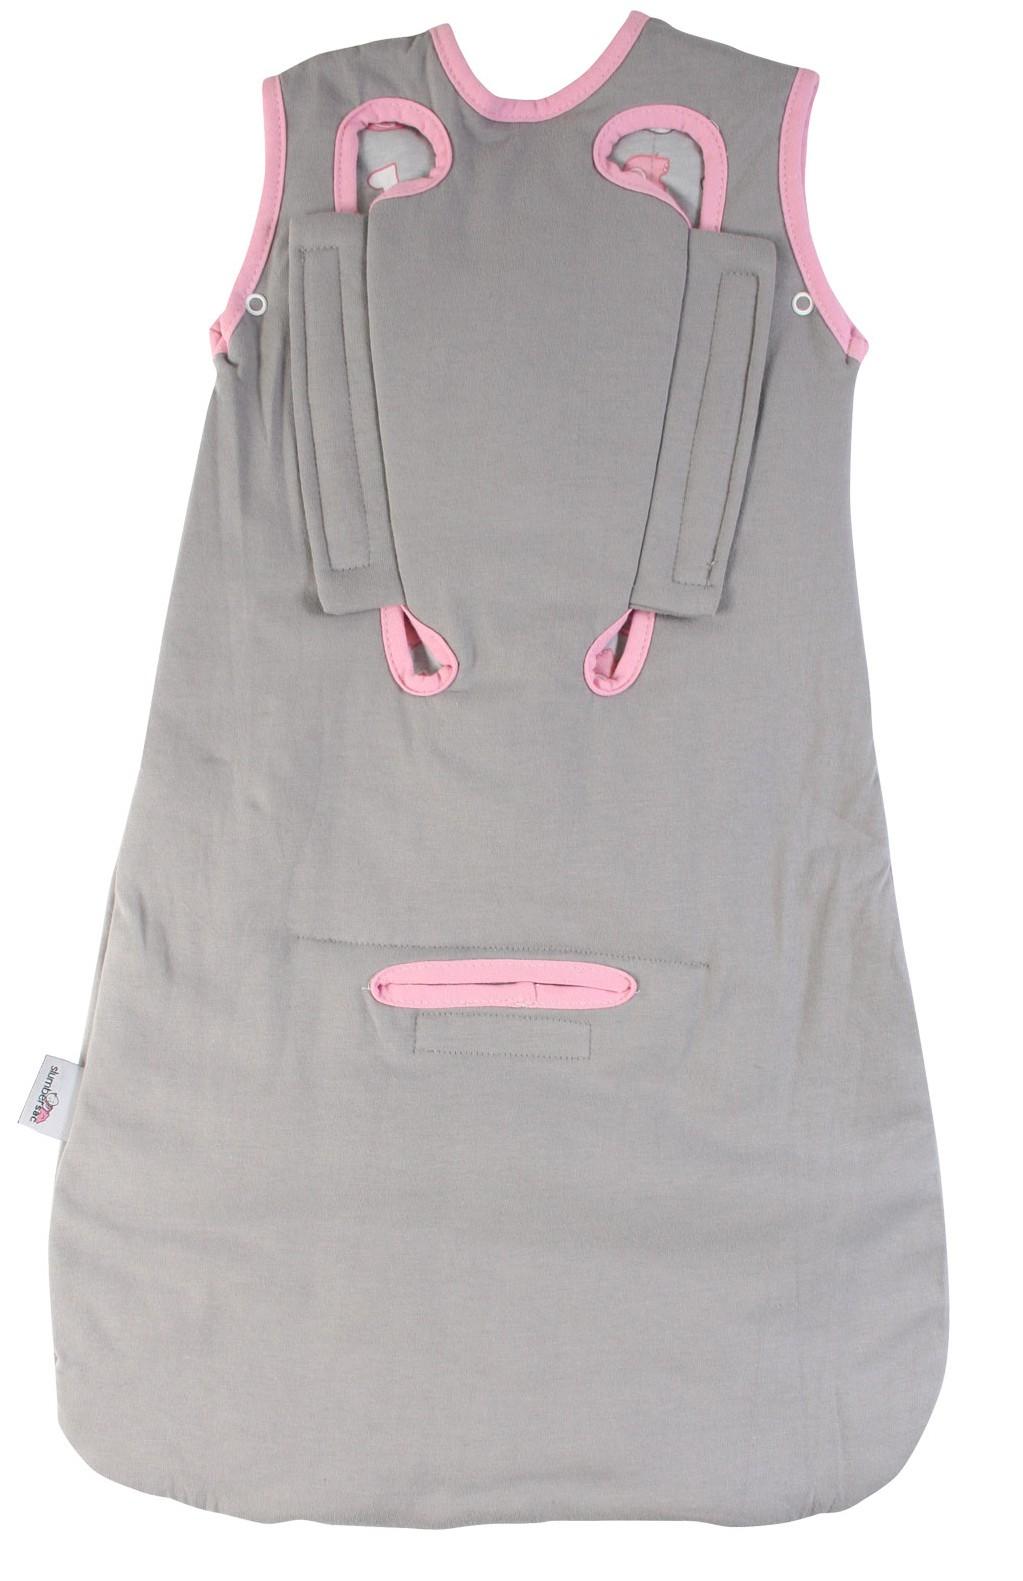 Sac de dormit multifunctional Grey Pink Elephant Travel 0-6 luni 2.5 Tog